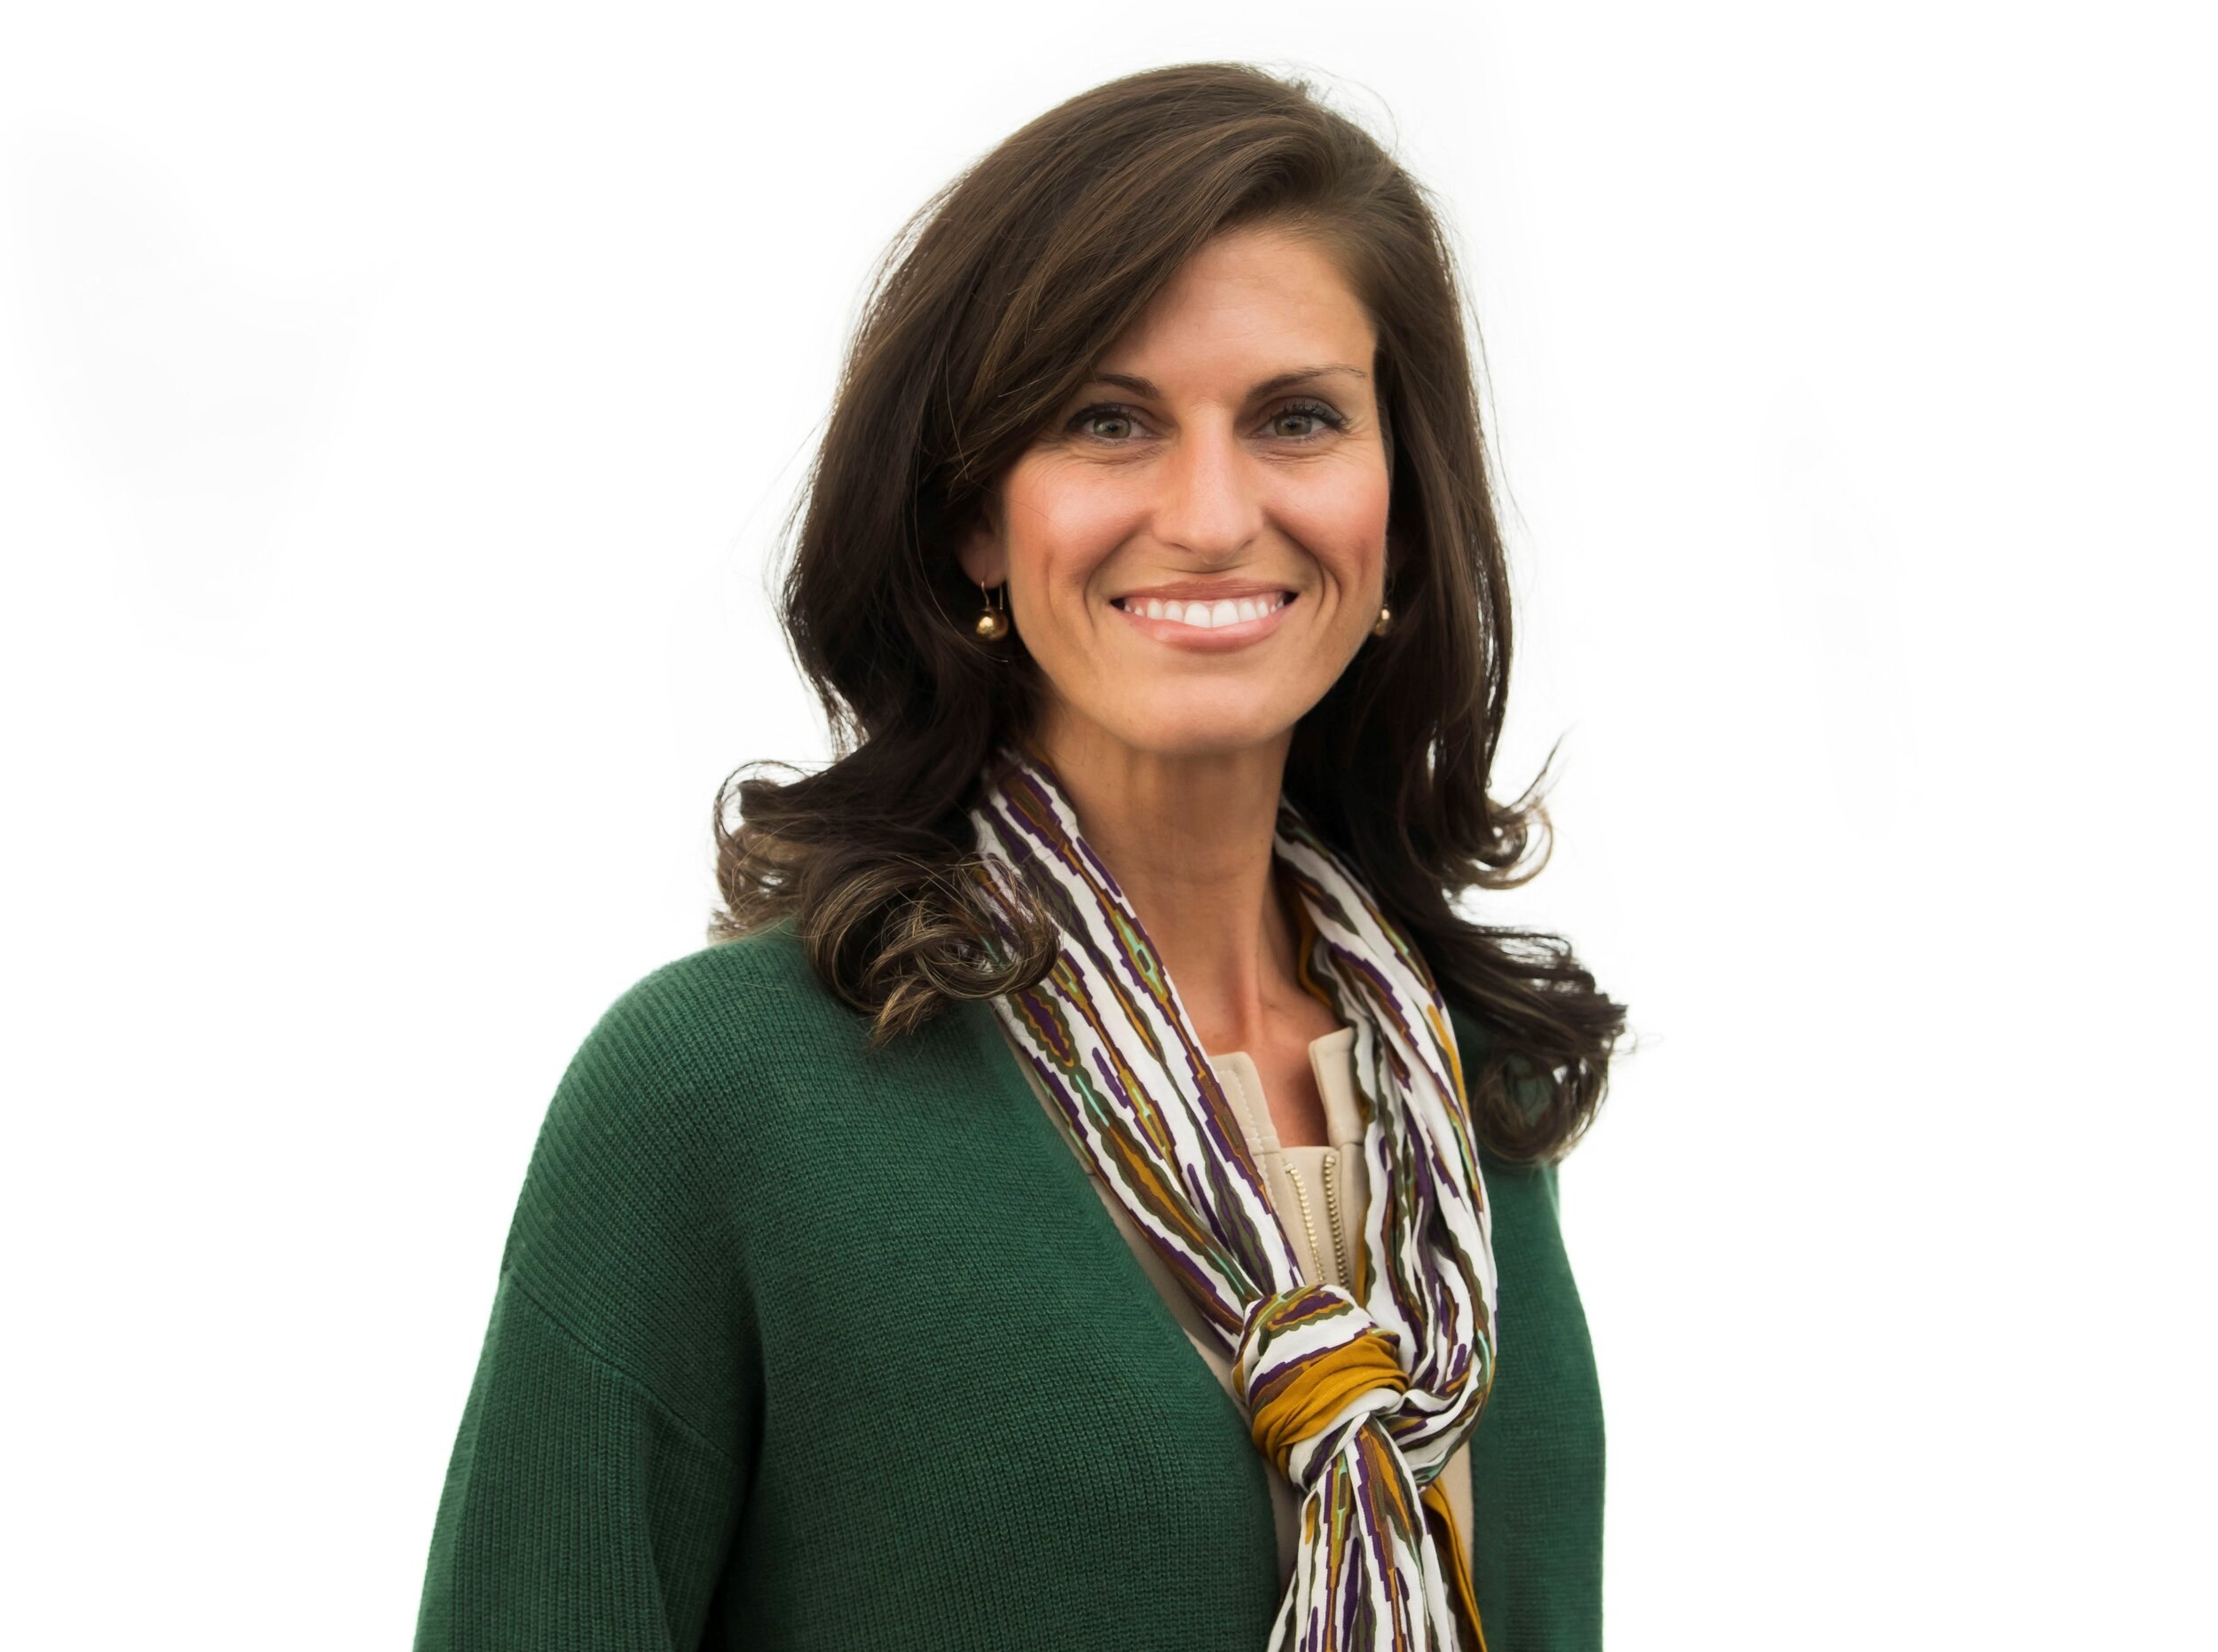 Kathleen O'Leary